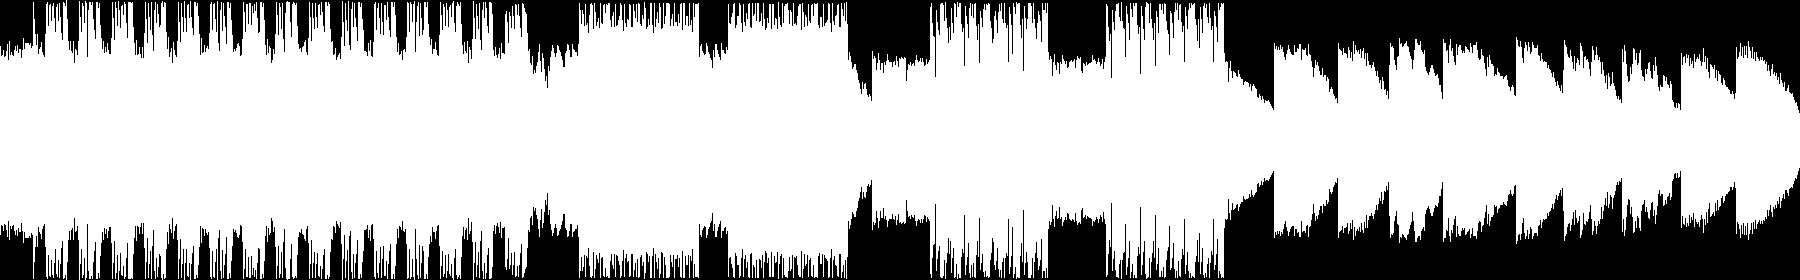 Rockstar 3 audio waveform